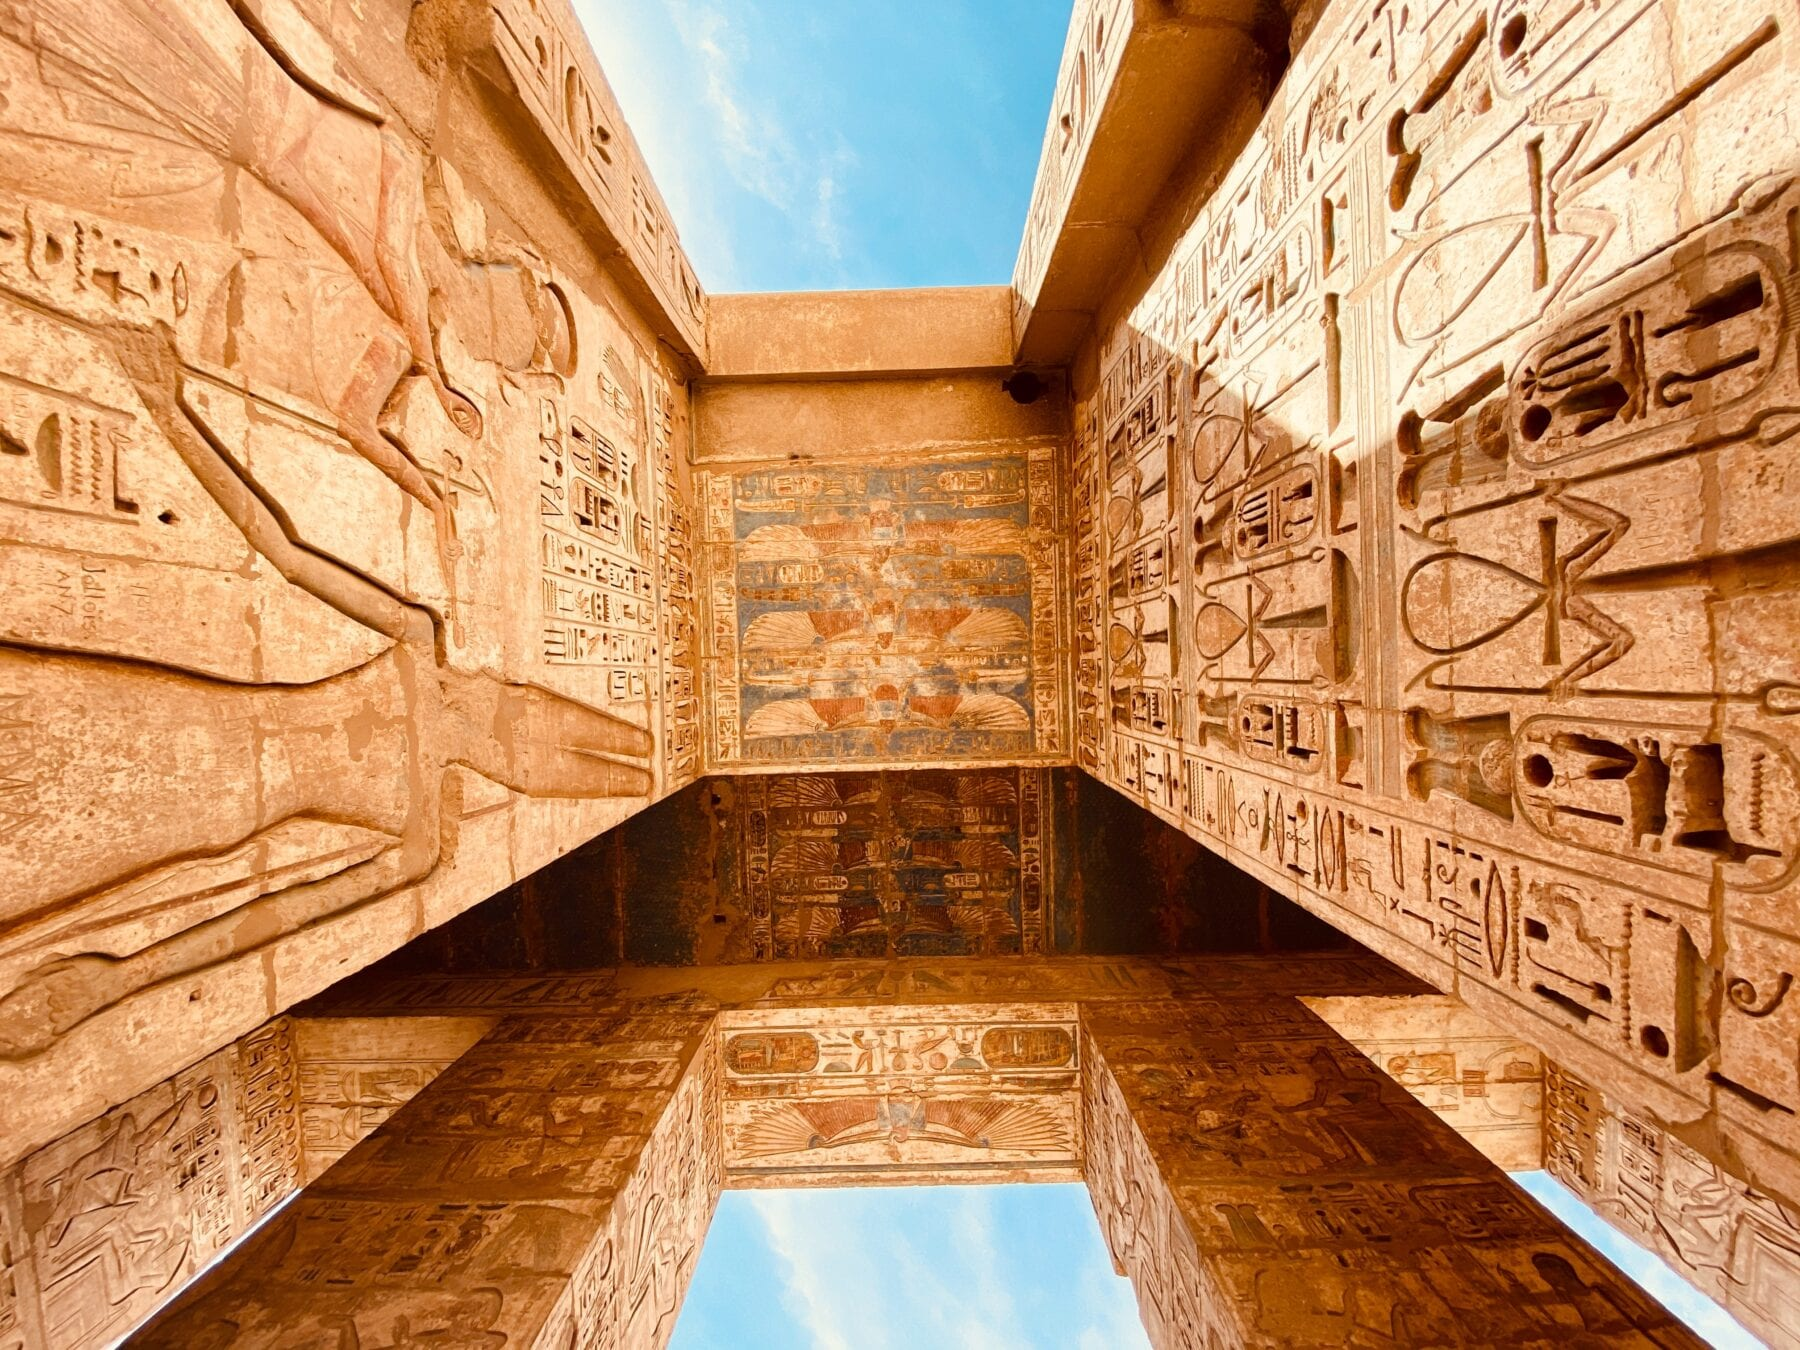 Oudheid Egypte - Piramides van Gizeh